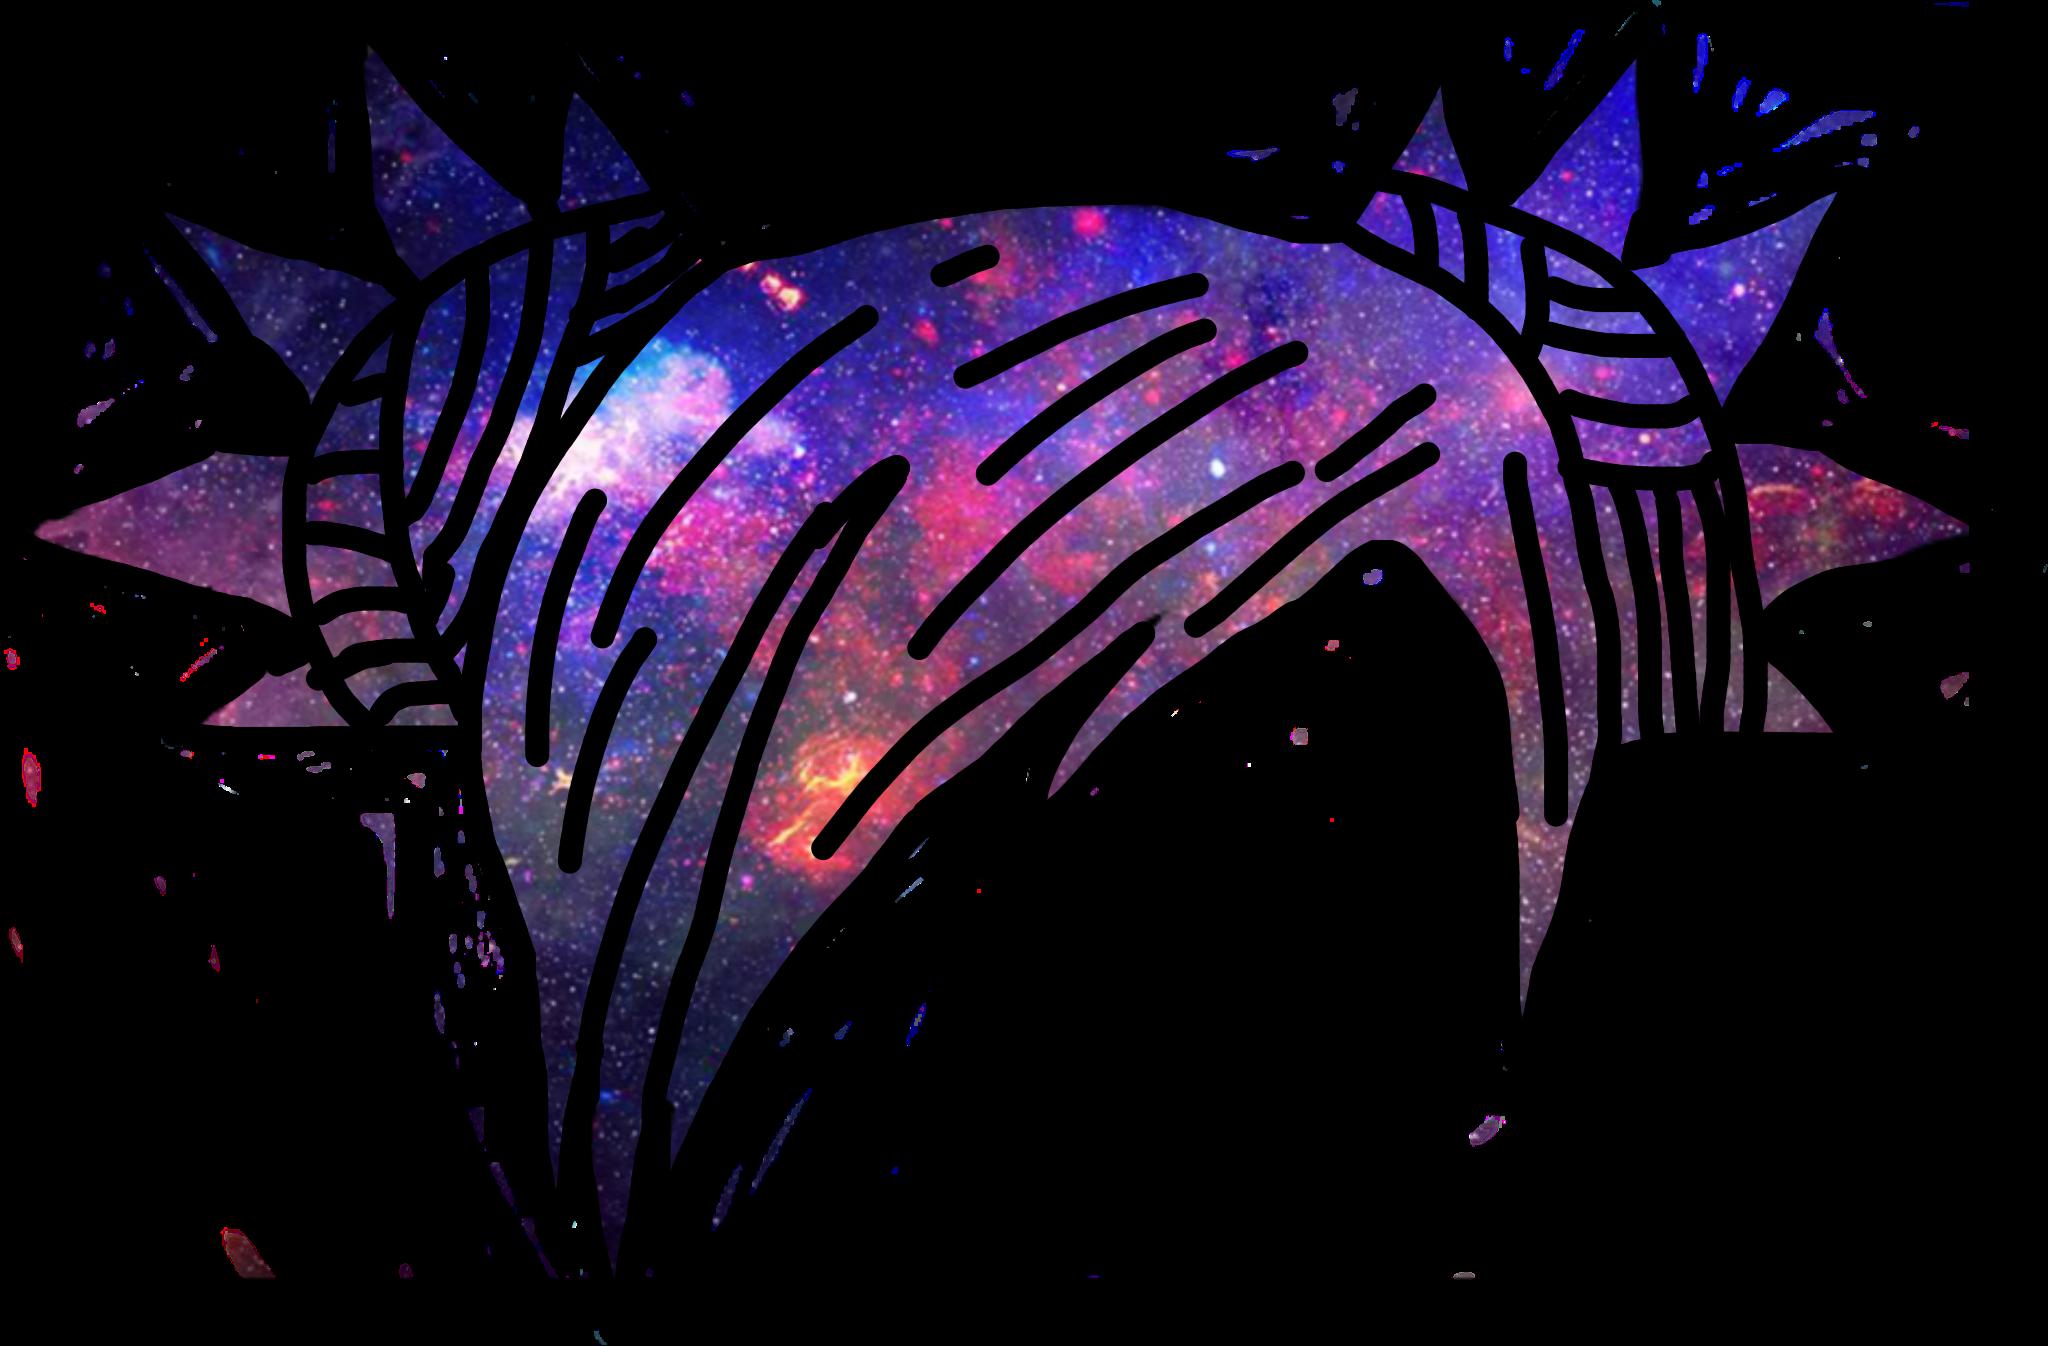 Not My Best Galaxyhair Hair Gacha Purple Black Freetoedit Remixit Anime Wolf Girl Manga Clothes Cute Kawaii Drawings